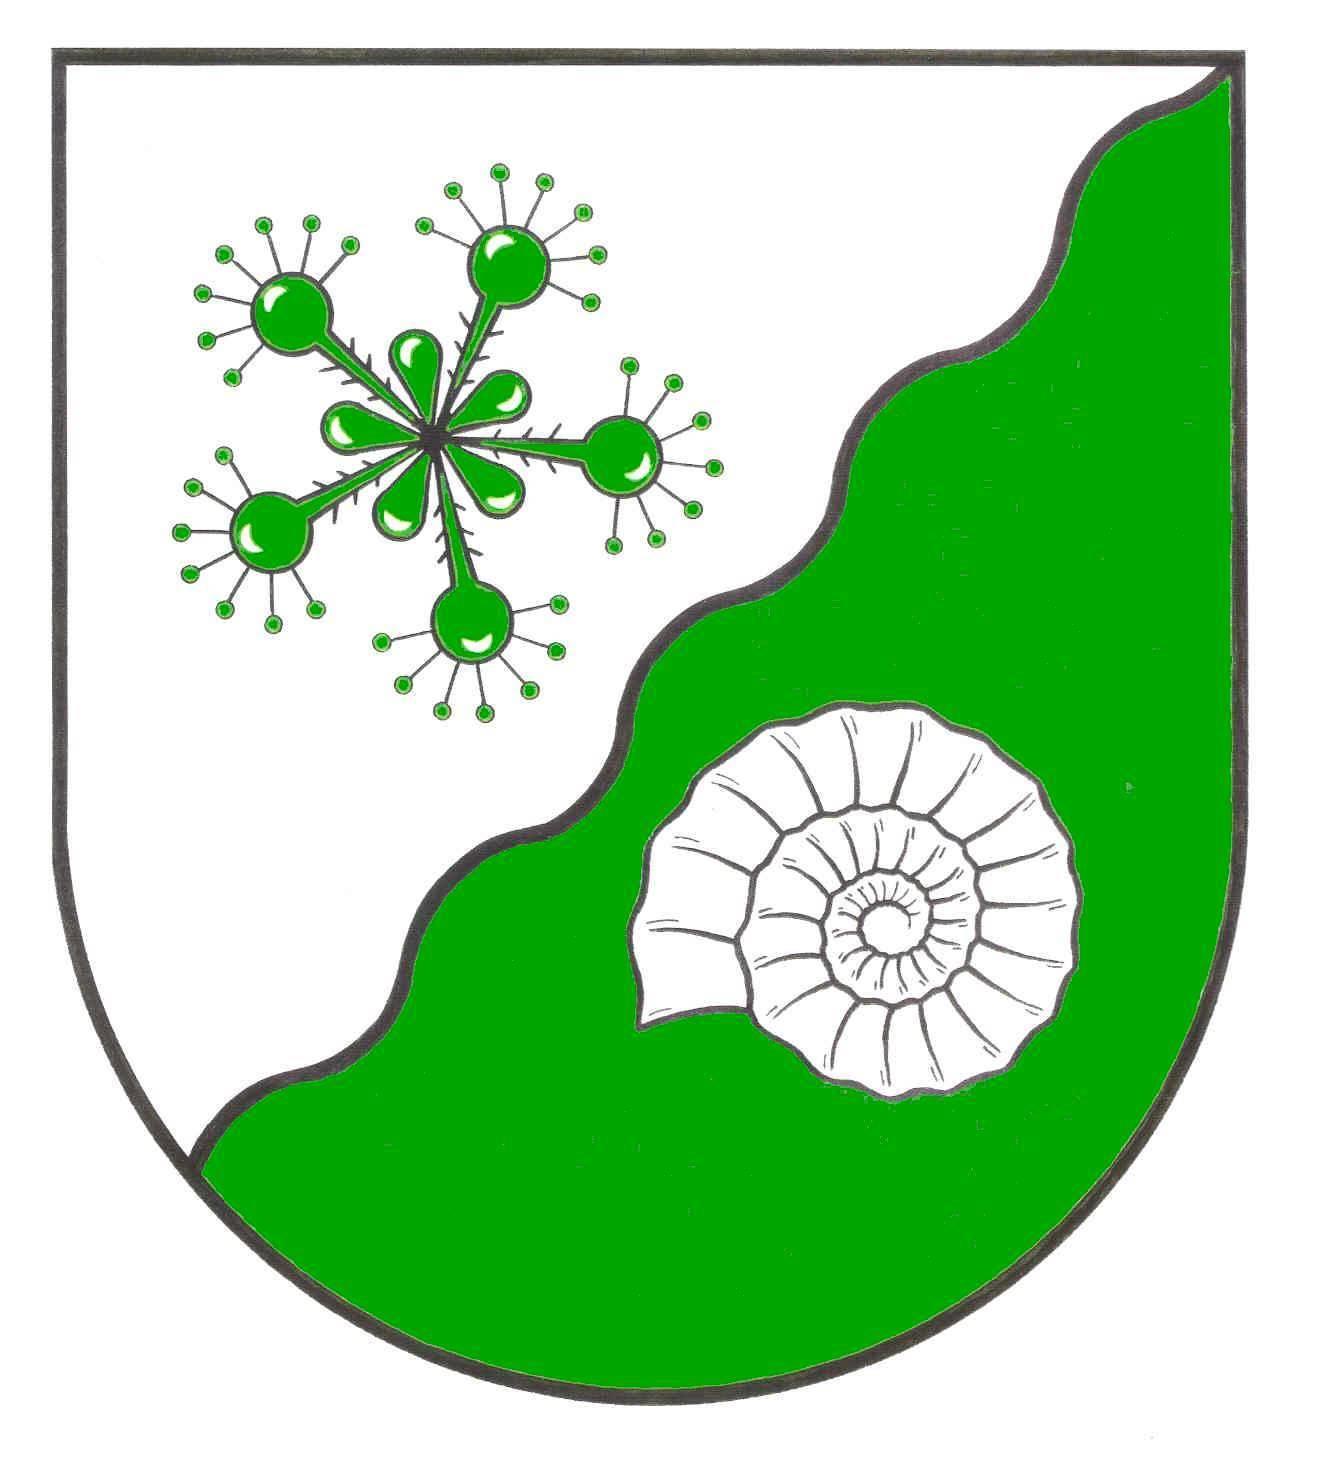 Wappen GemeindeTensfeld, Kreis Segeberg